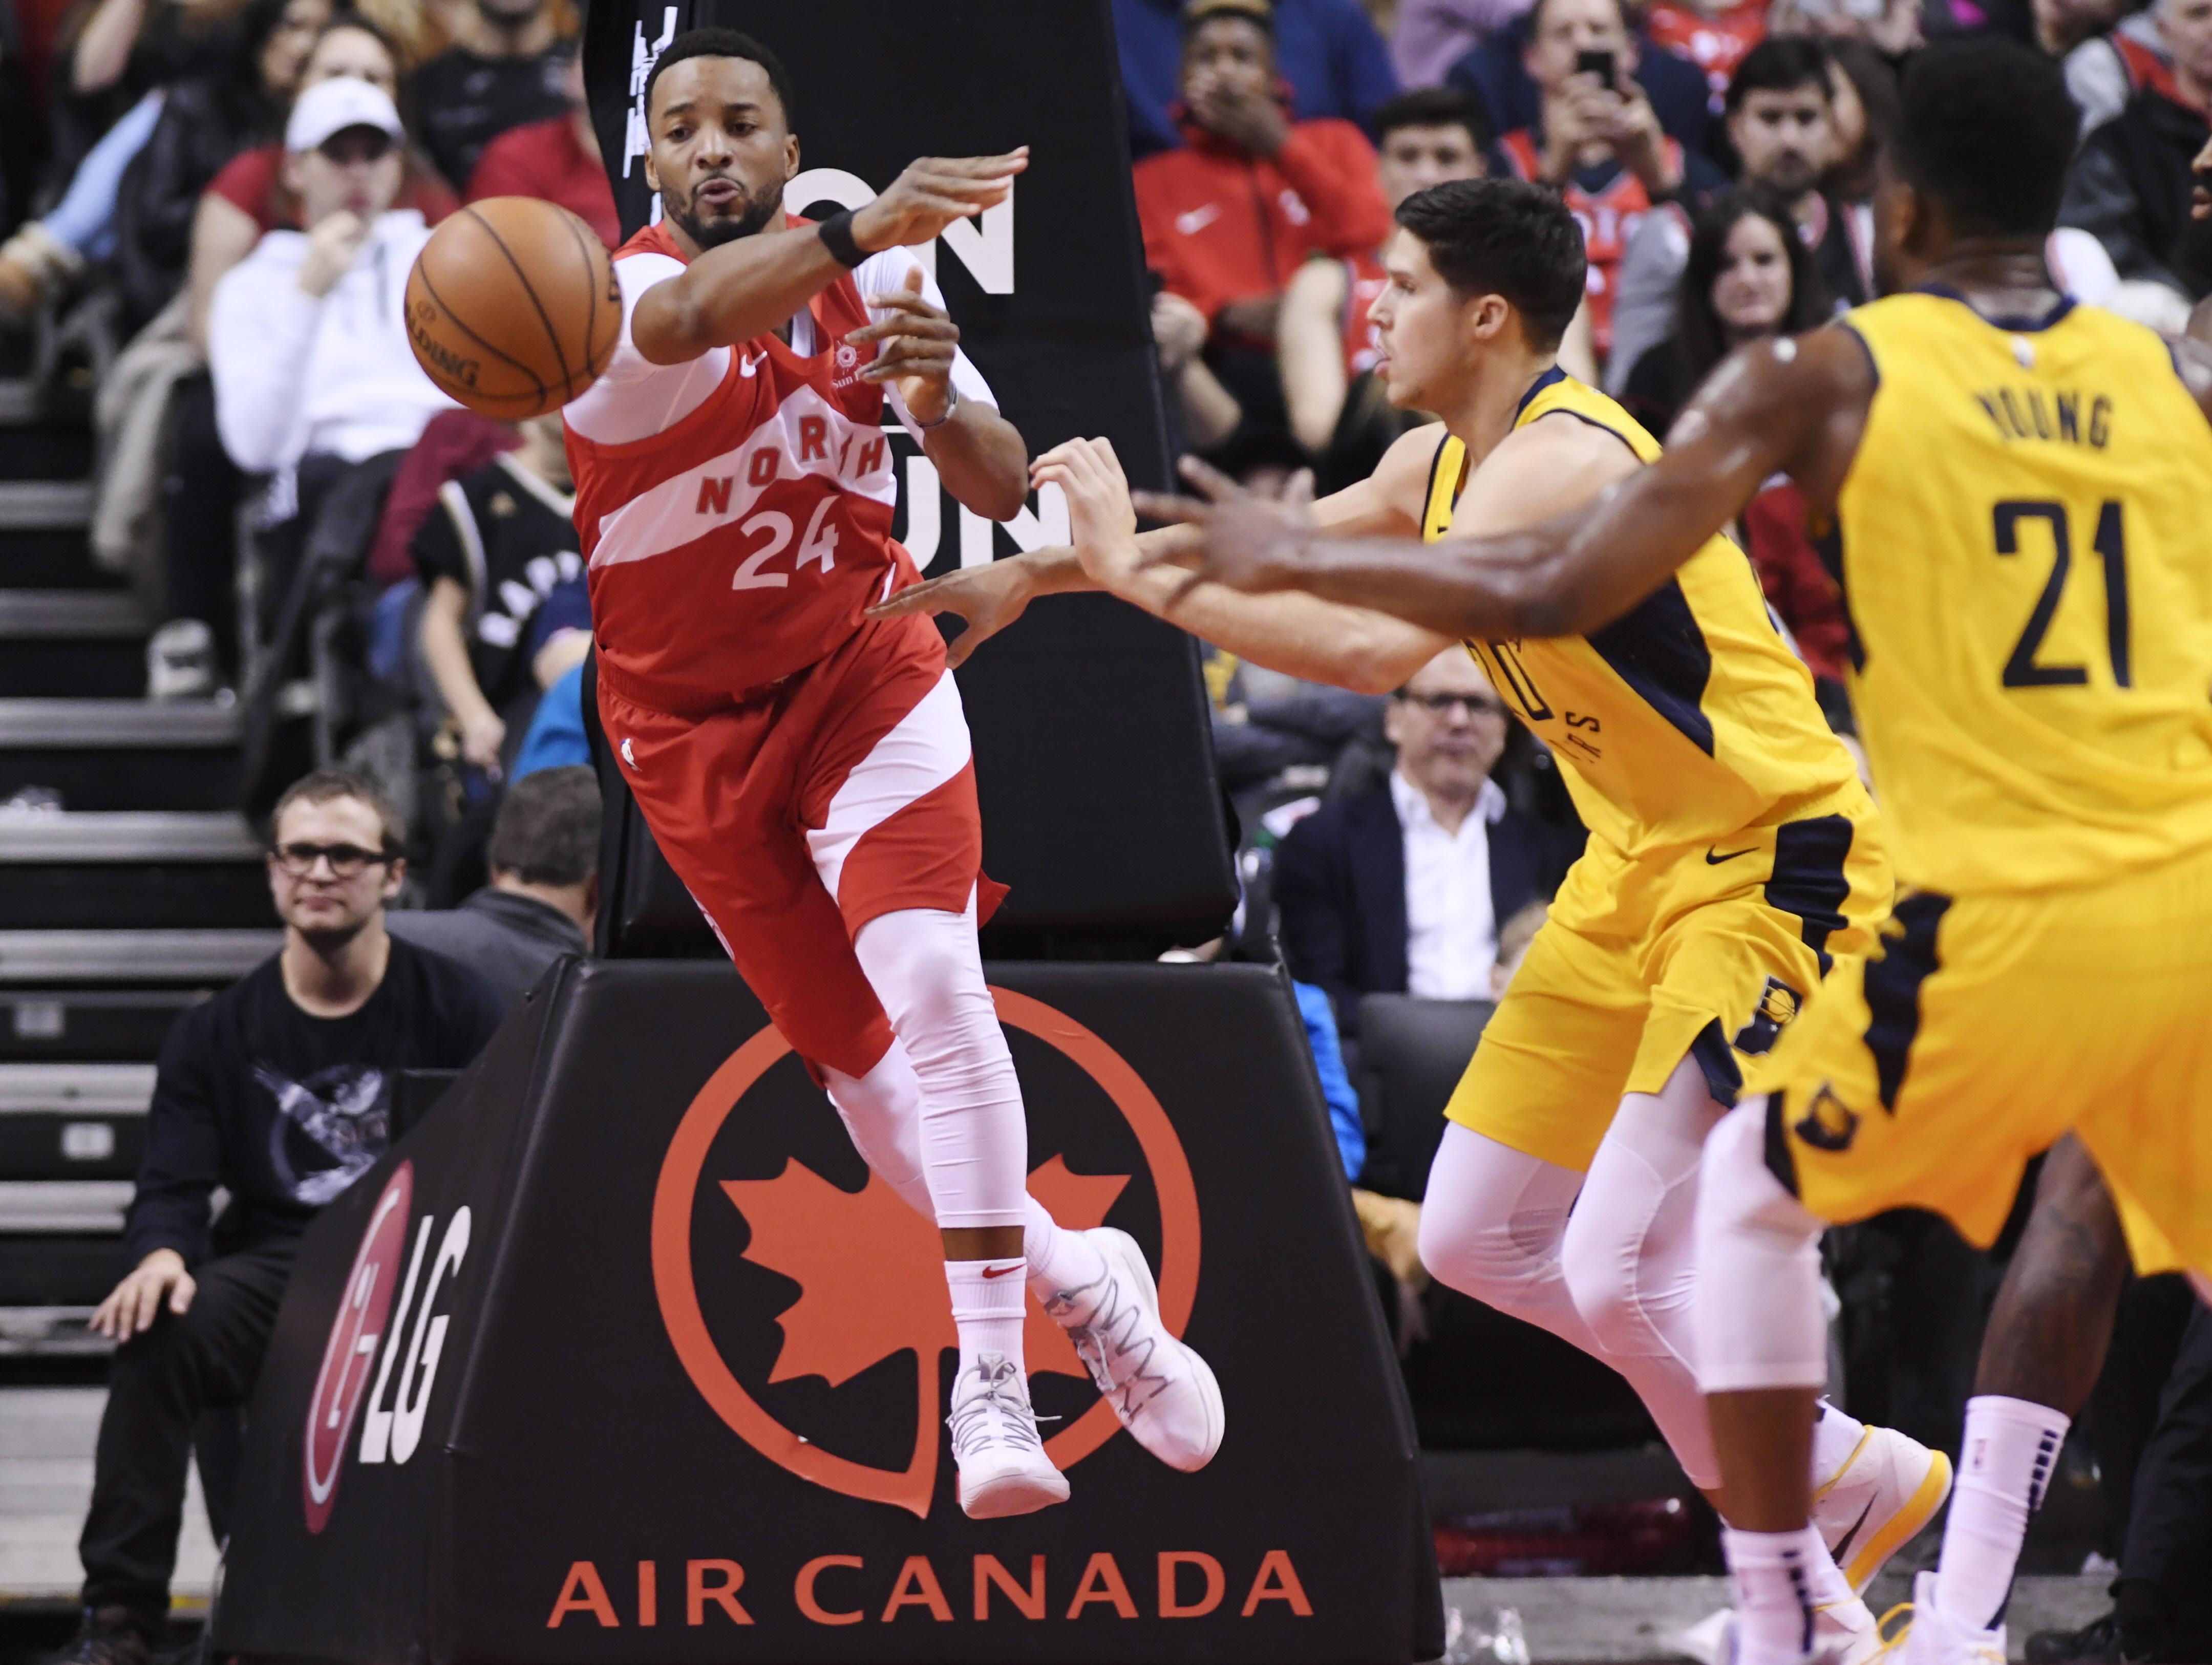 Powell scores-season-high 23, Raptors beat Pacers 121-105